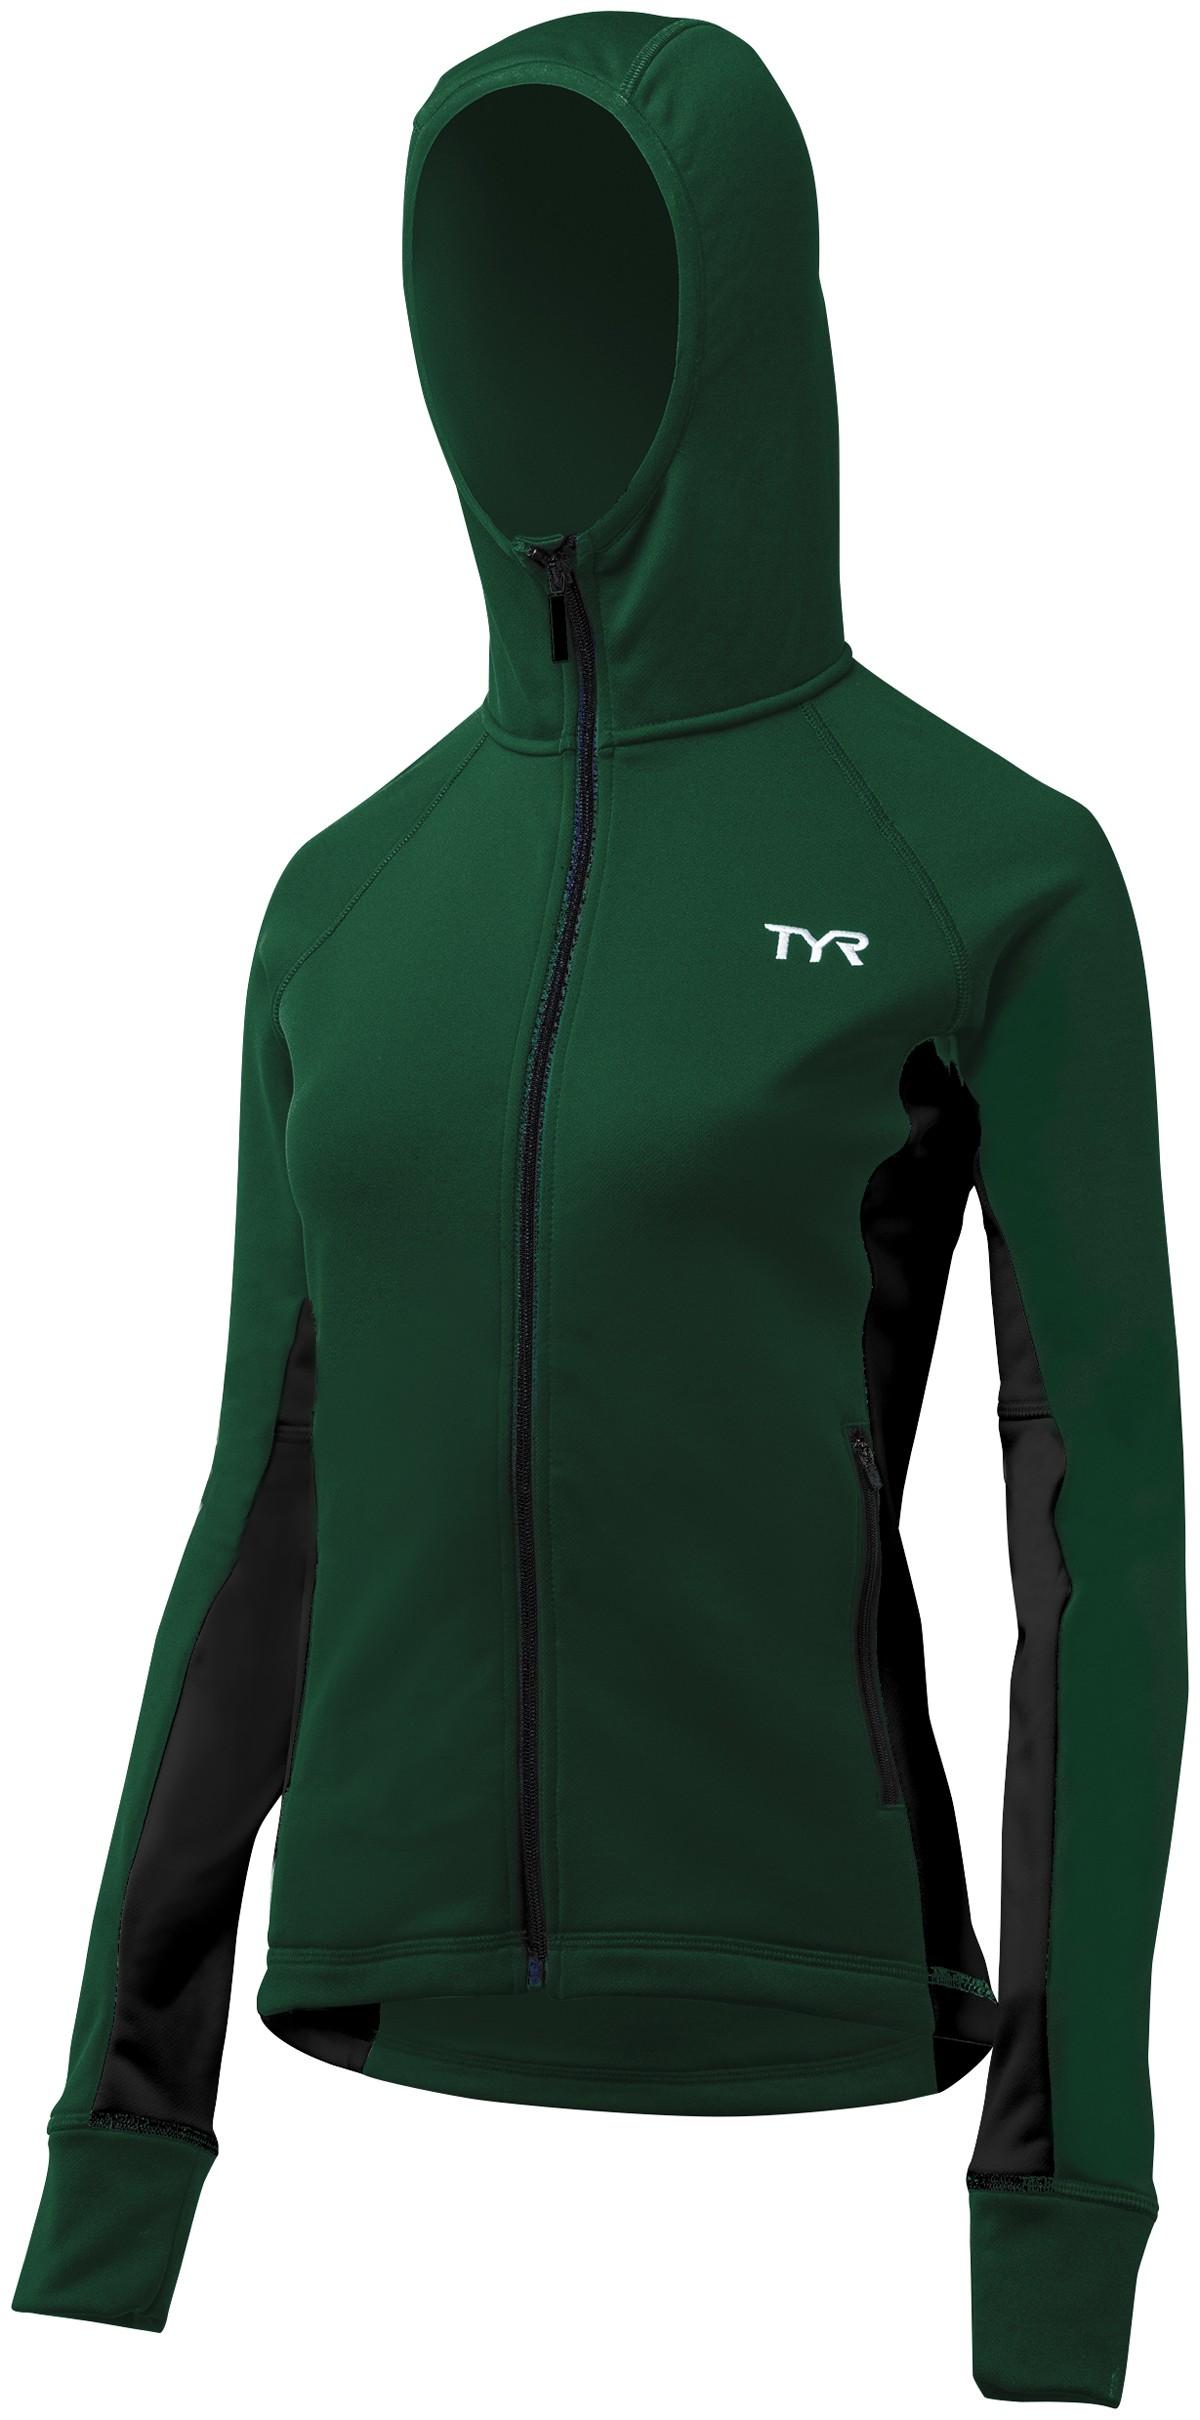 Women's Warm Up Alliance Victory Jacket Tyr xrwgrq